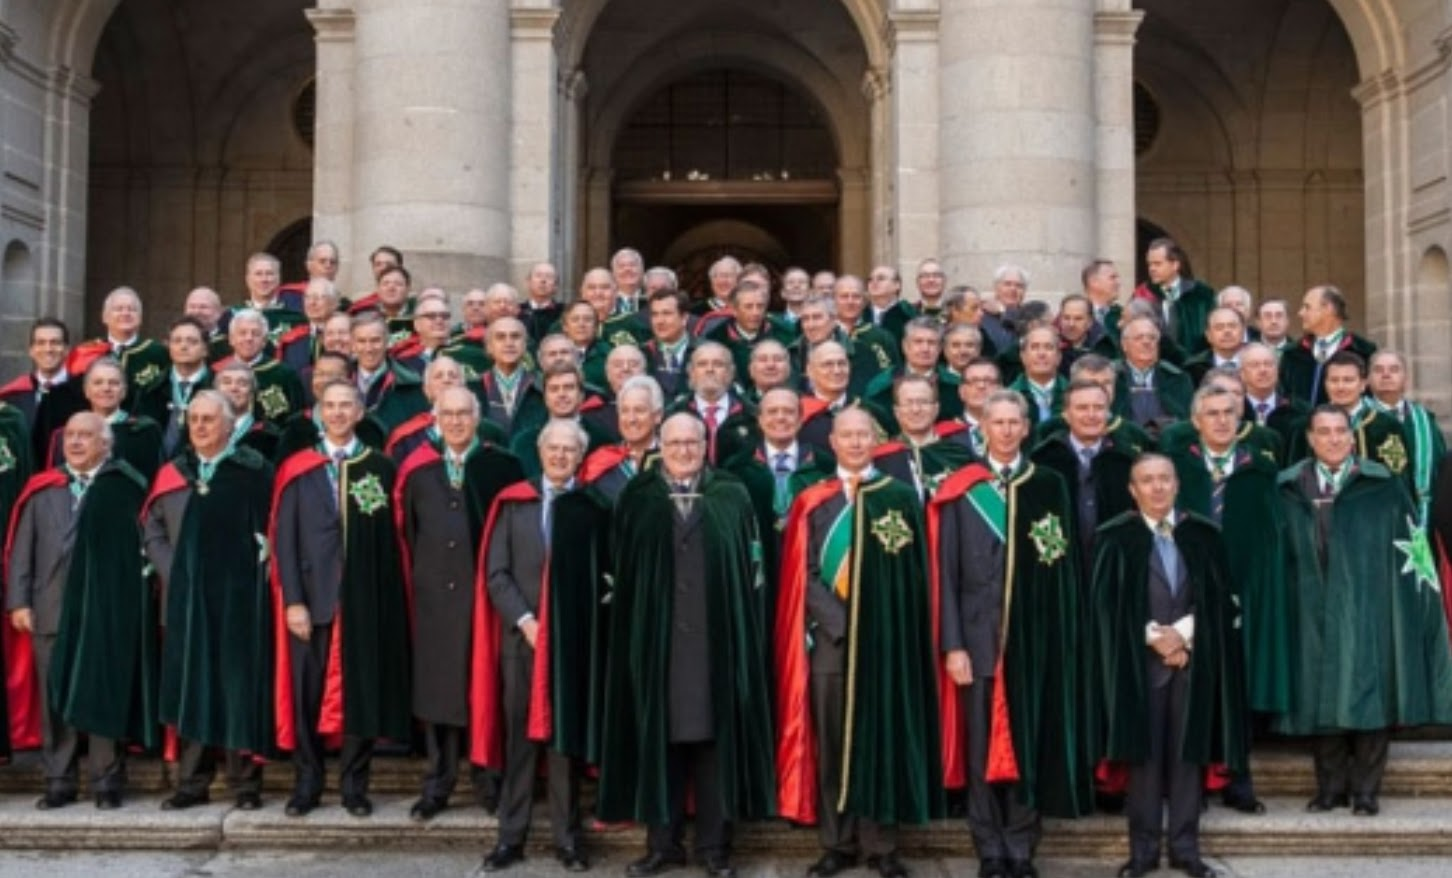 Some consider the Order of St Hubertus the 'Illuminati of the hunting world'